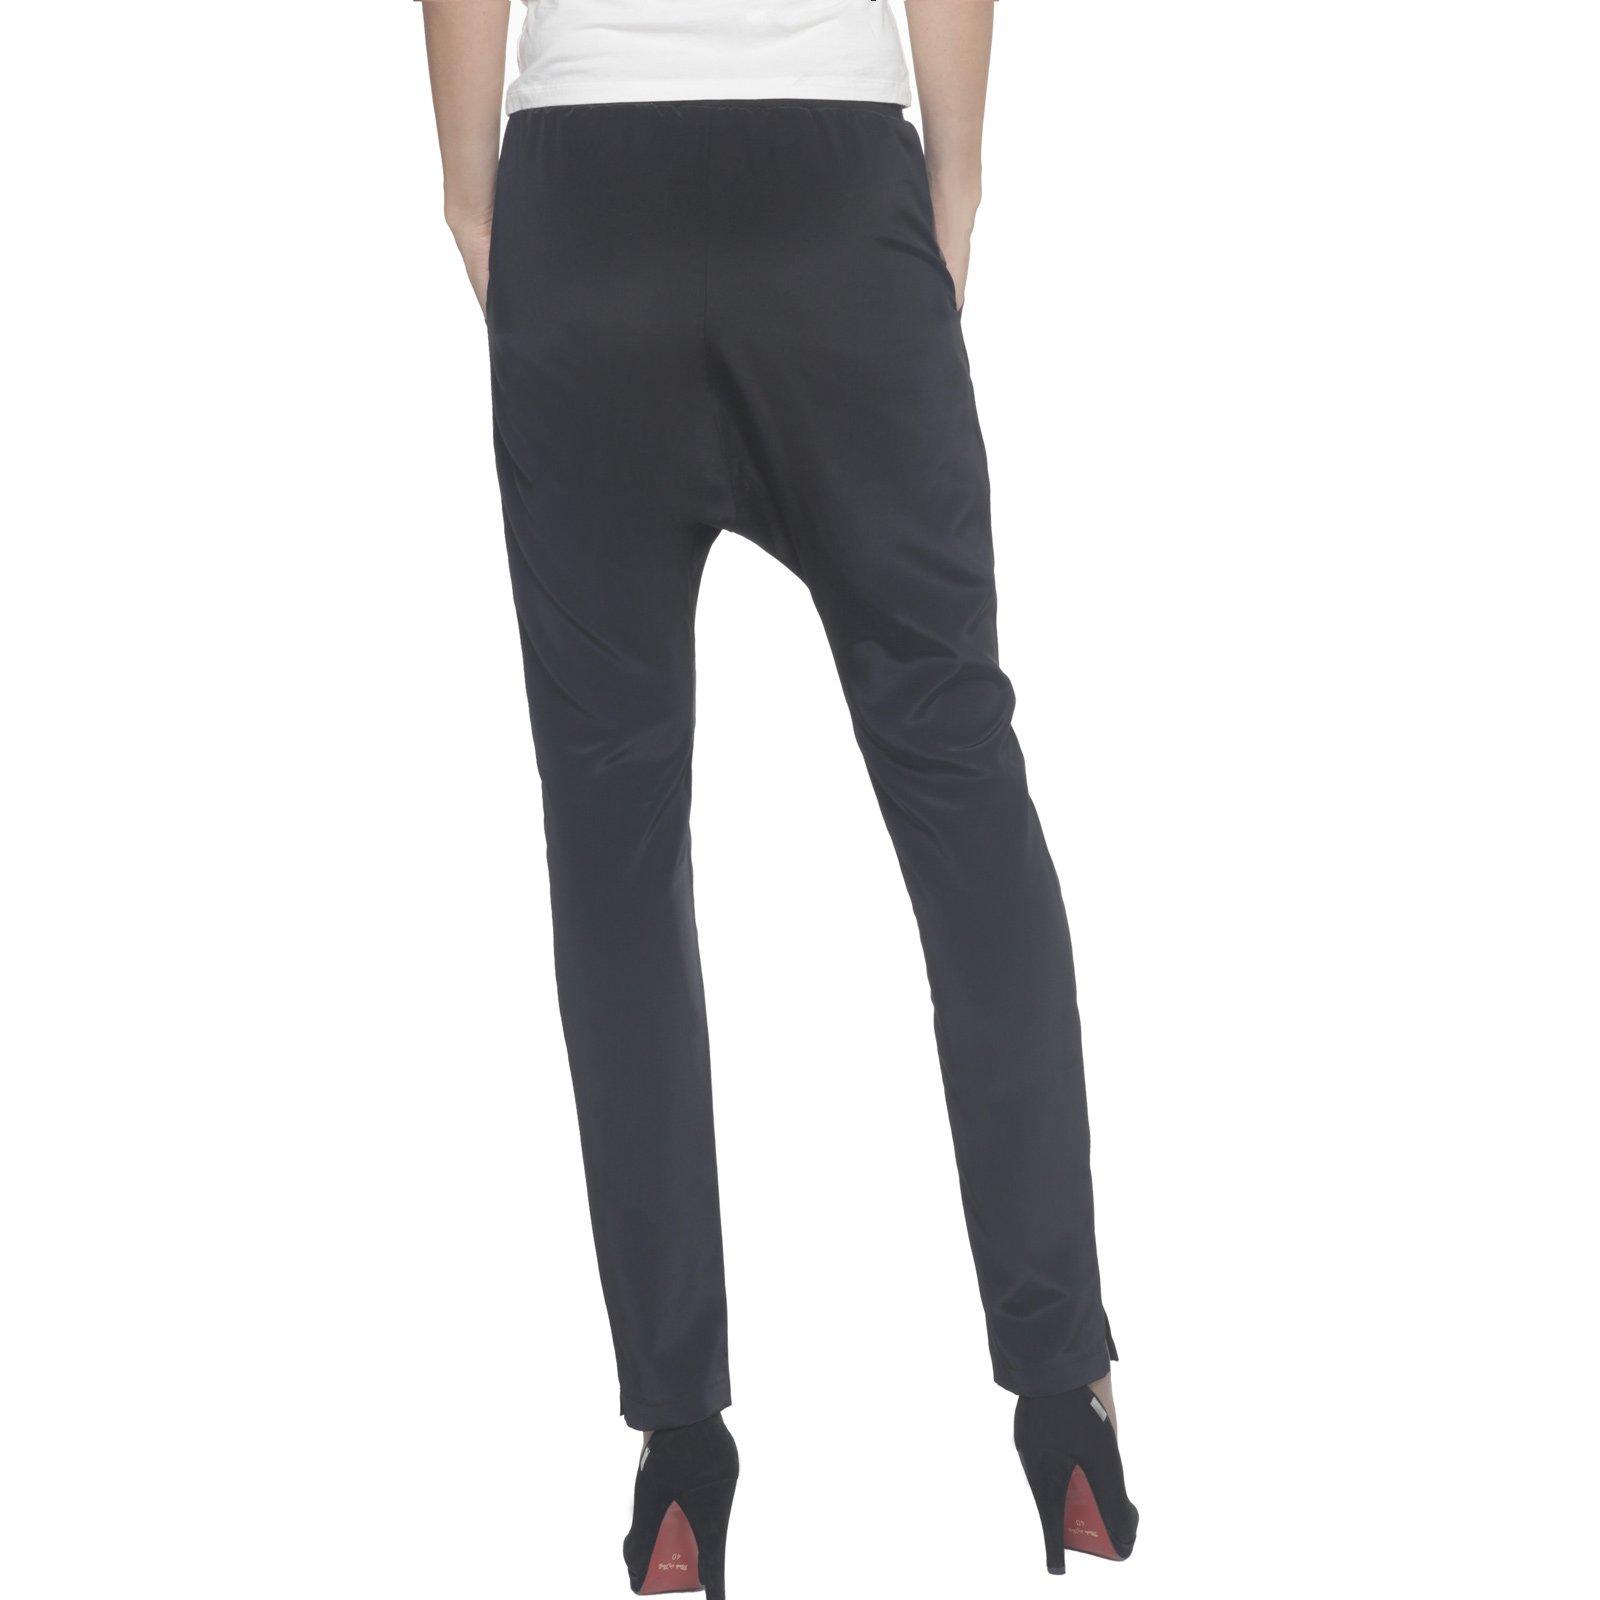 SILVIAN HEACH, Silvian heach pantalone nero, pants chroden, pantalone nero donna, pantalone vita elasticizzata, pantalone chino